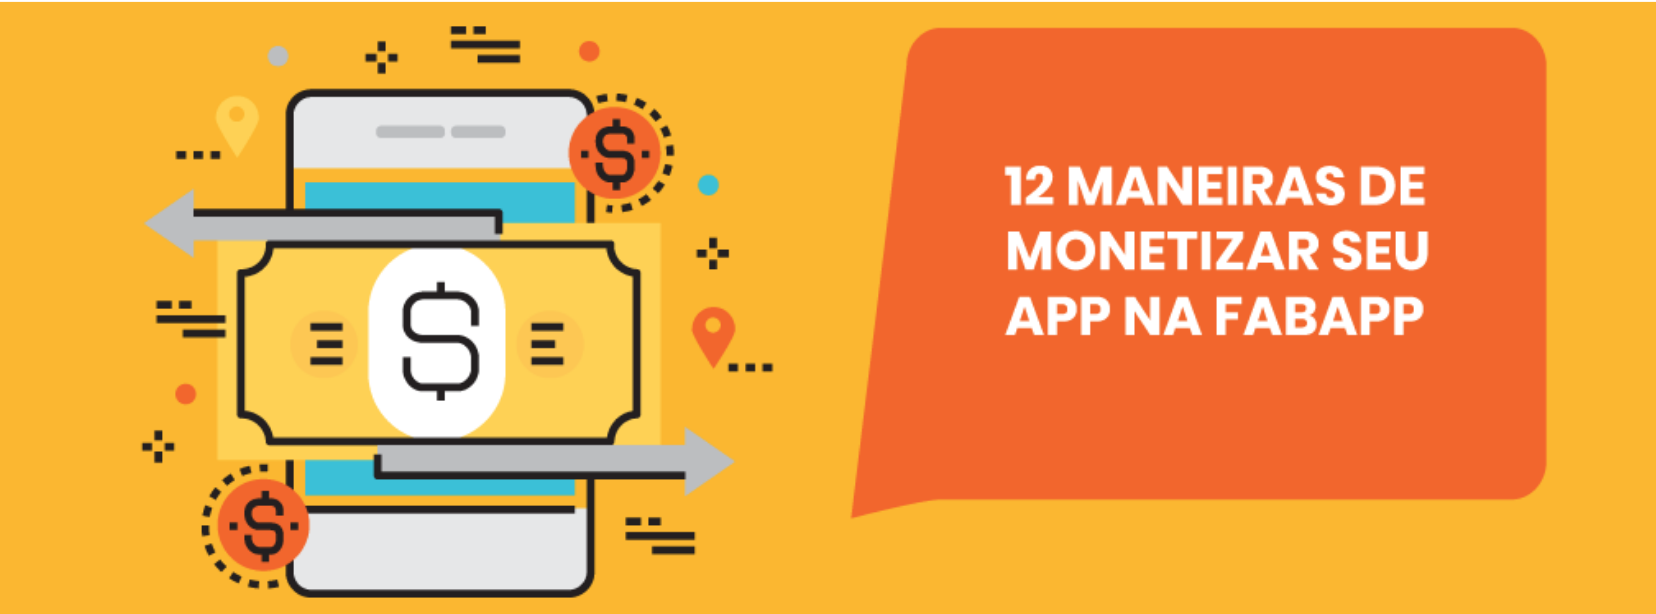 12_maneiras_monetizar aplicativos